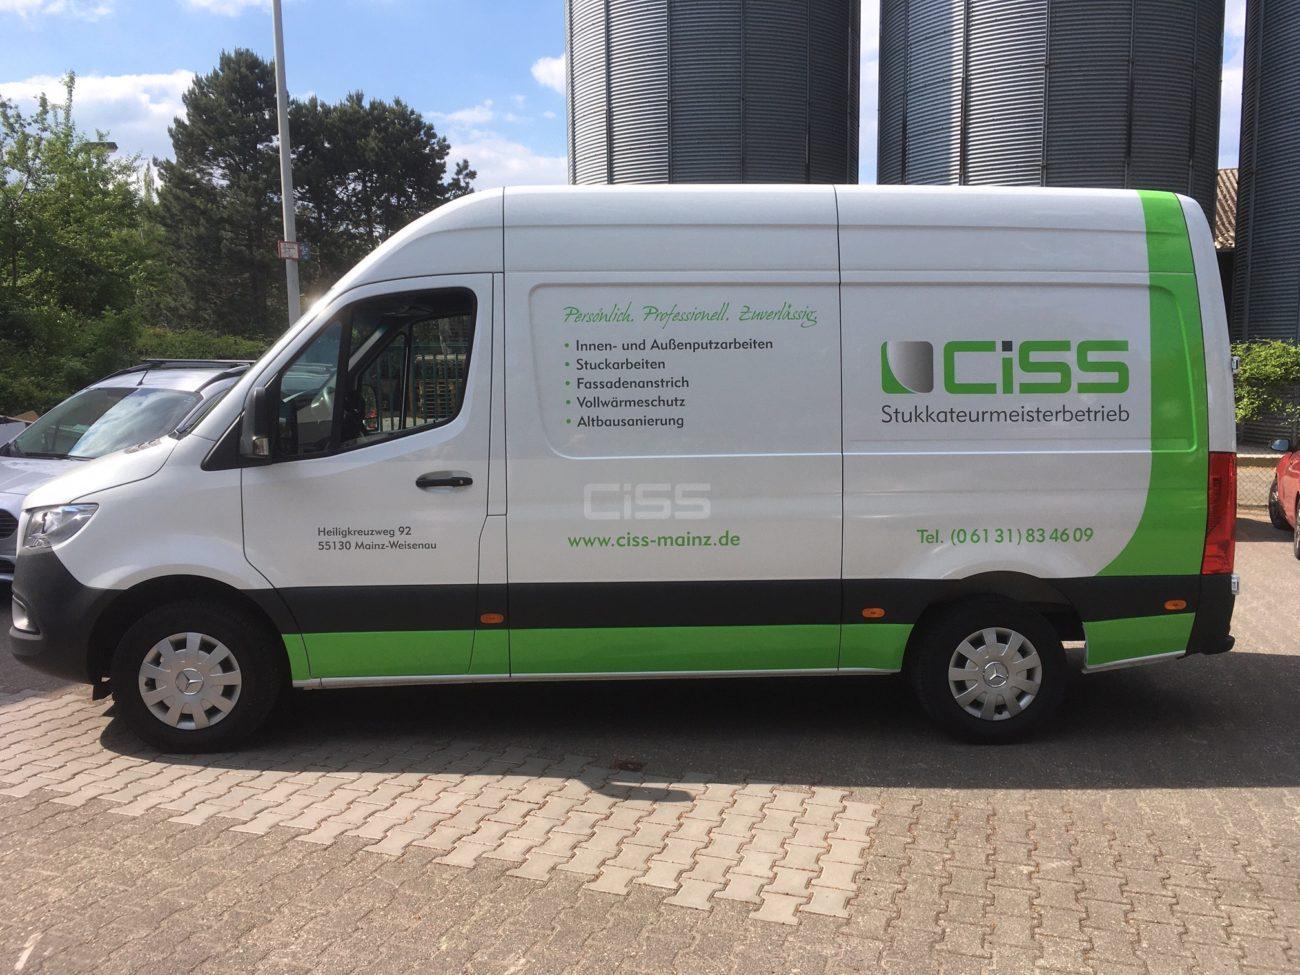 Fahrzeugbeschriftung CISS von links